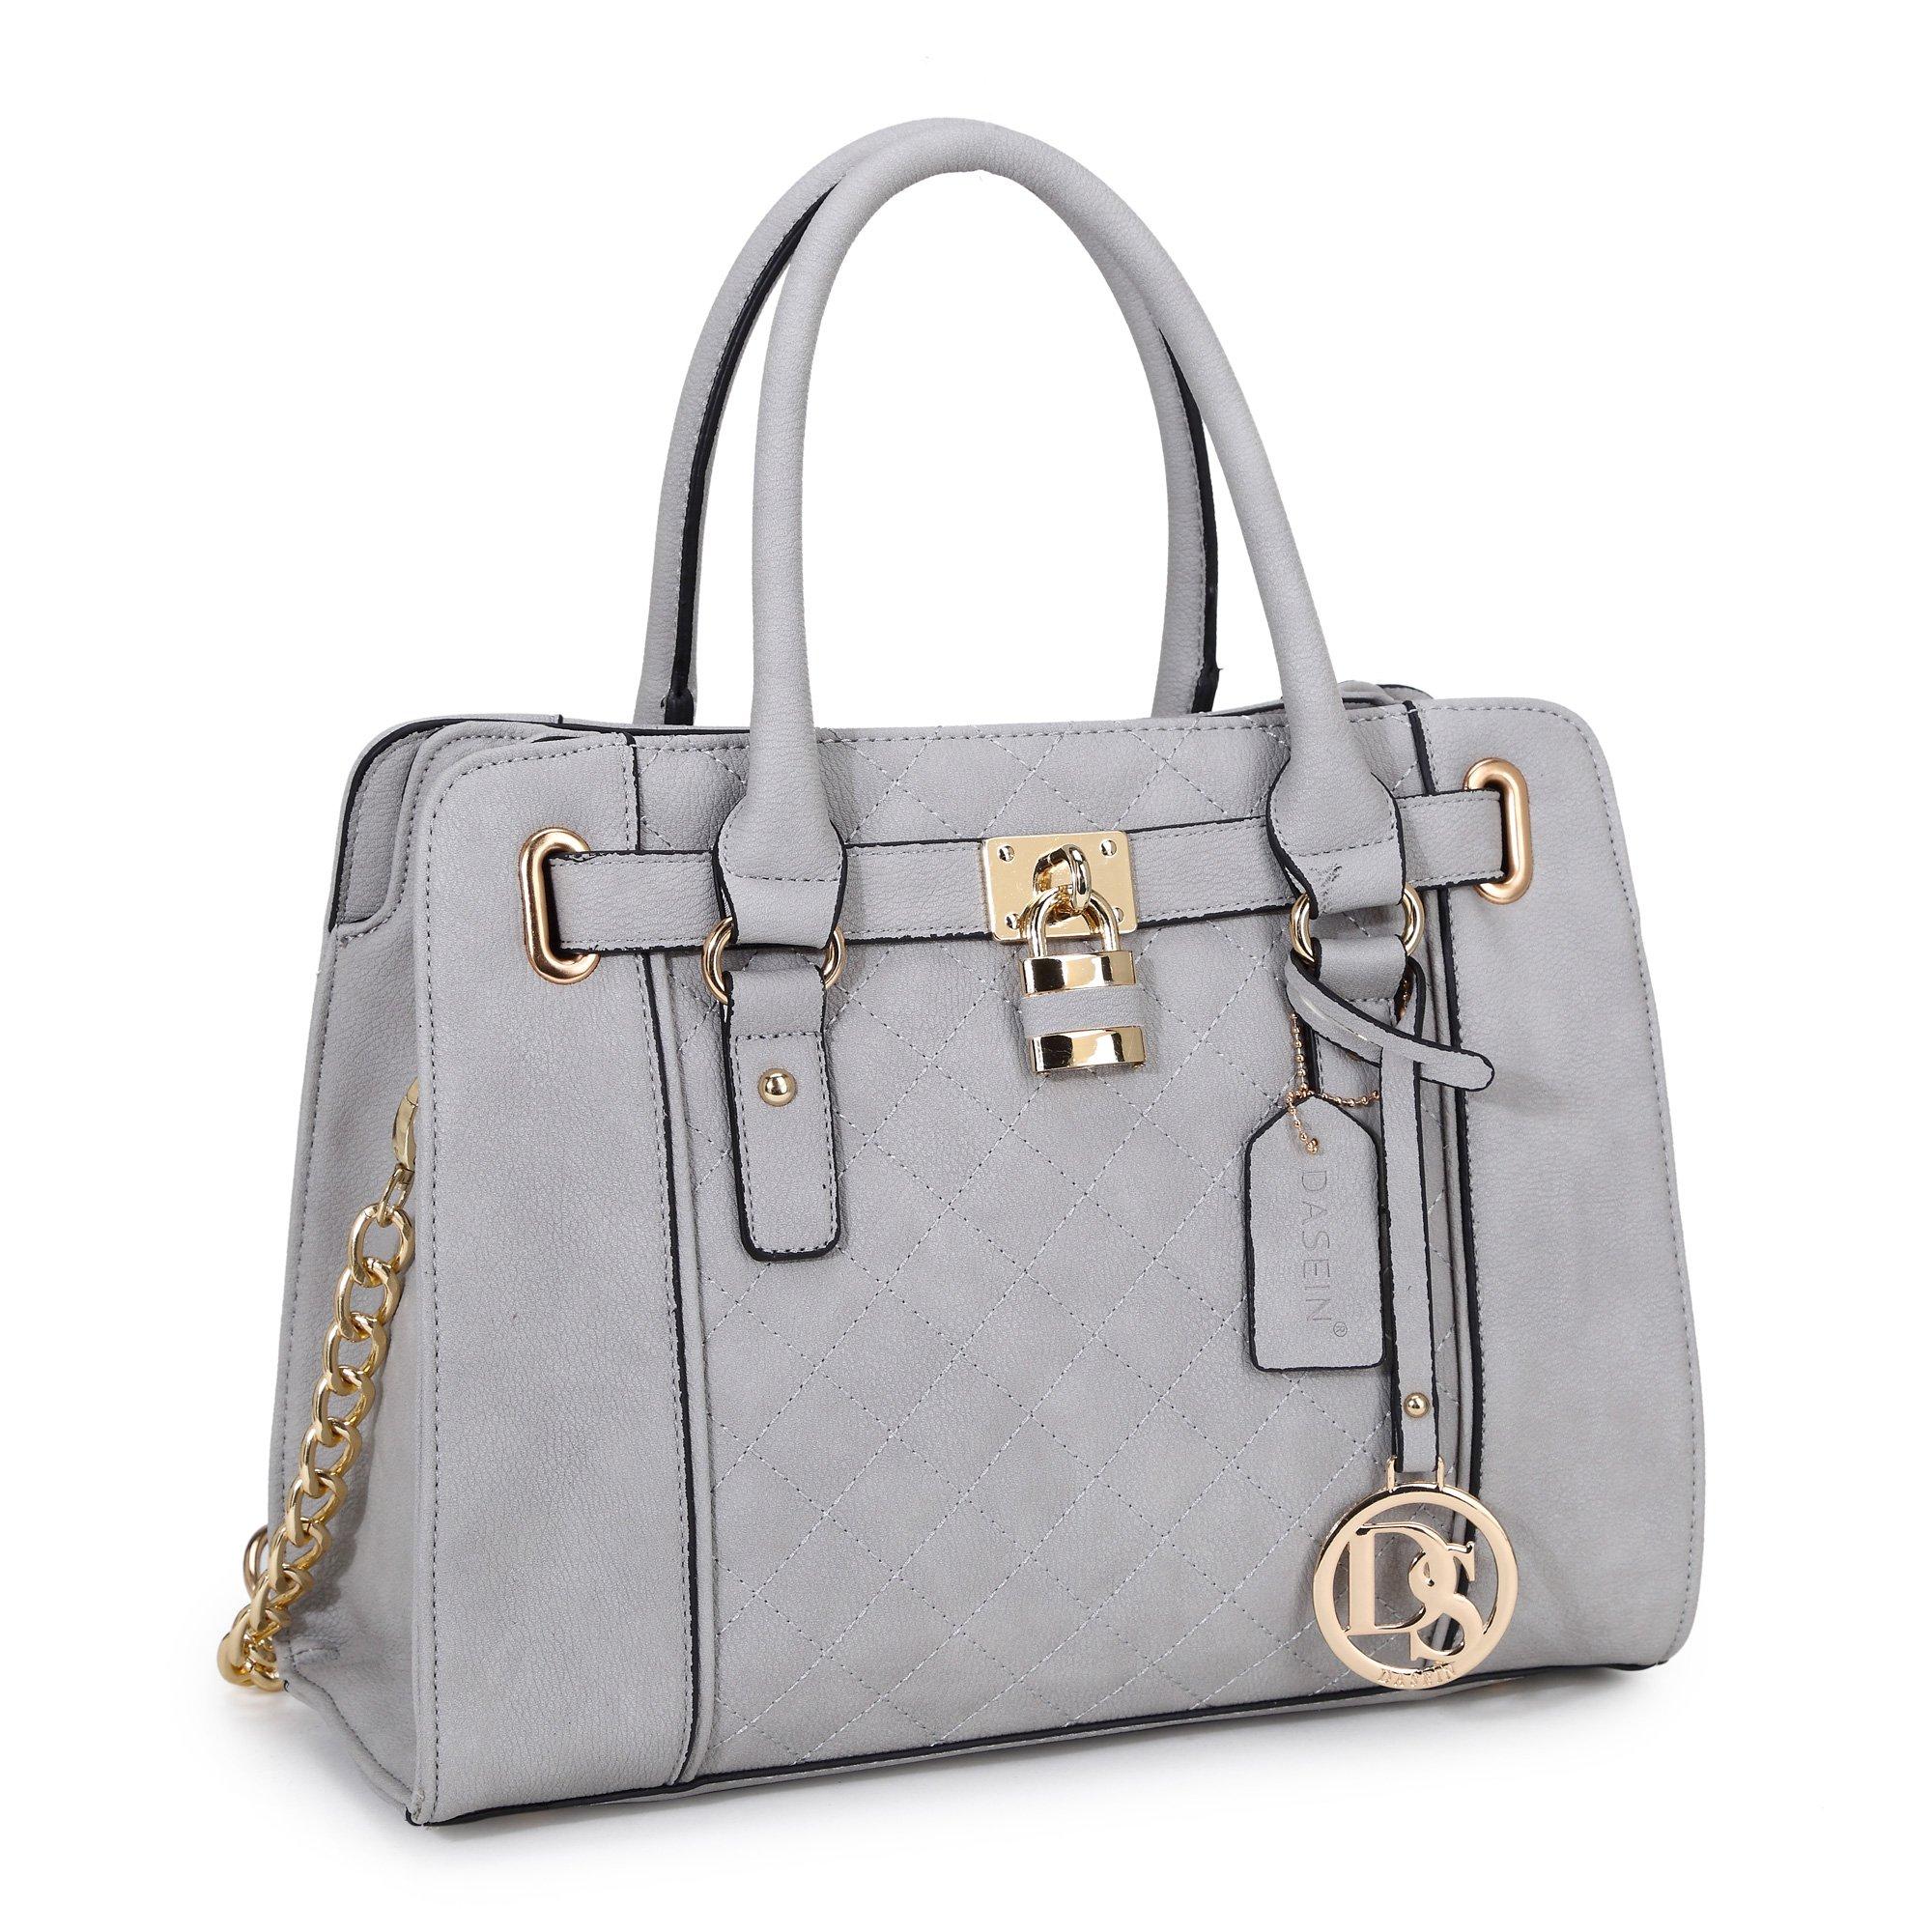 Dasein Womens Handbag Fashion Padlock Shoulder Bag Structured Satchel Bag Designer Purse